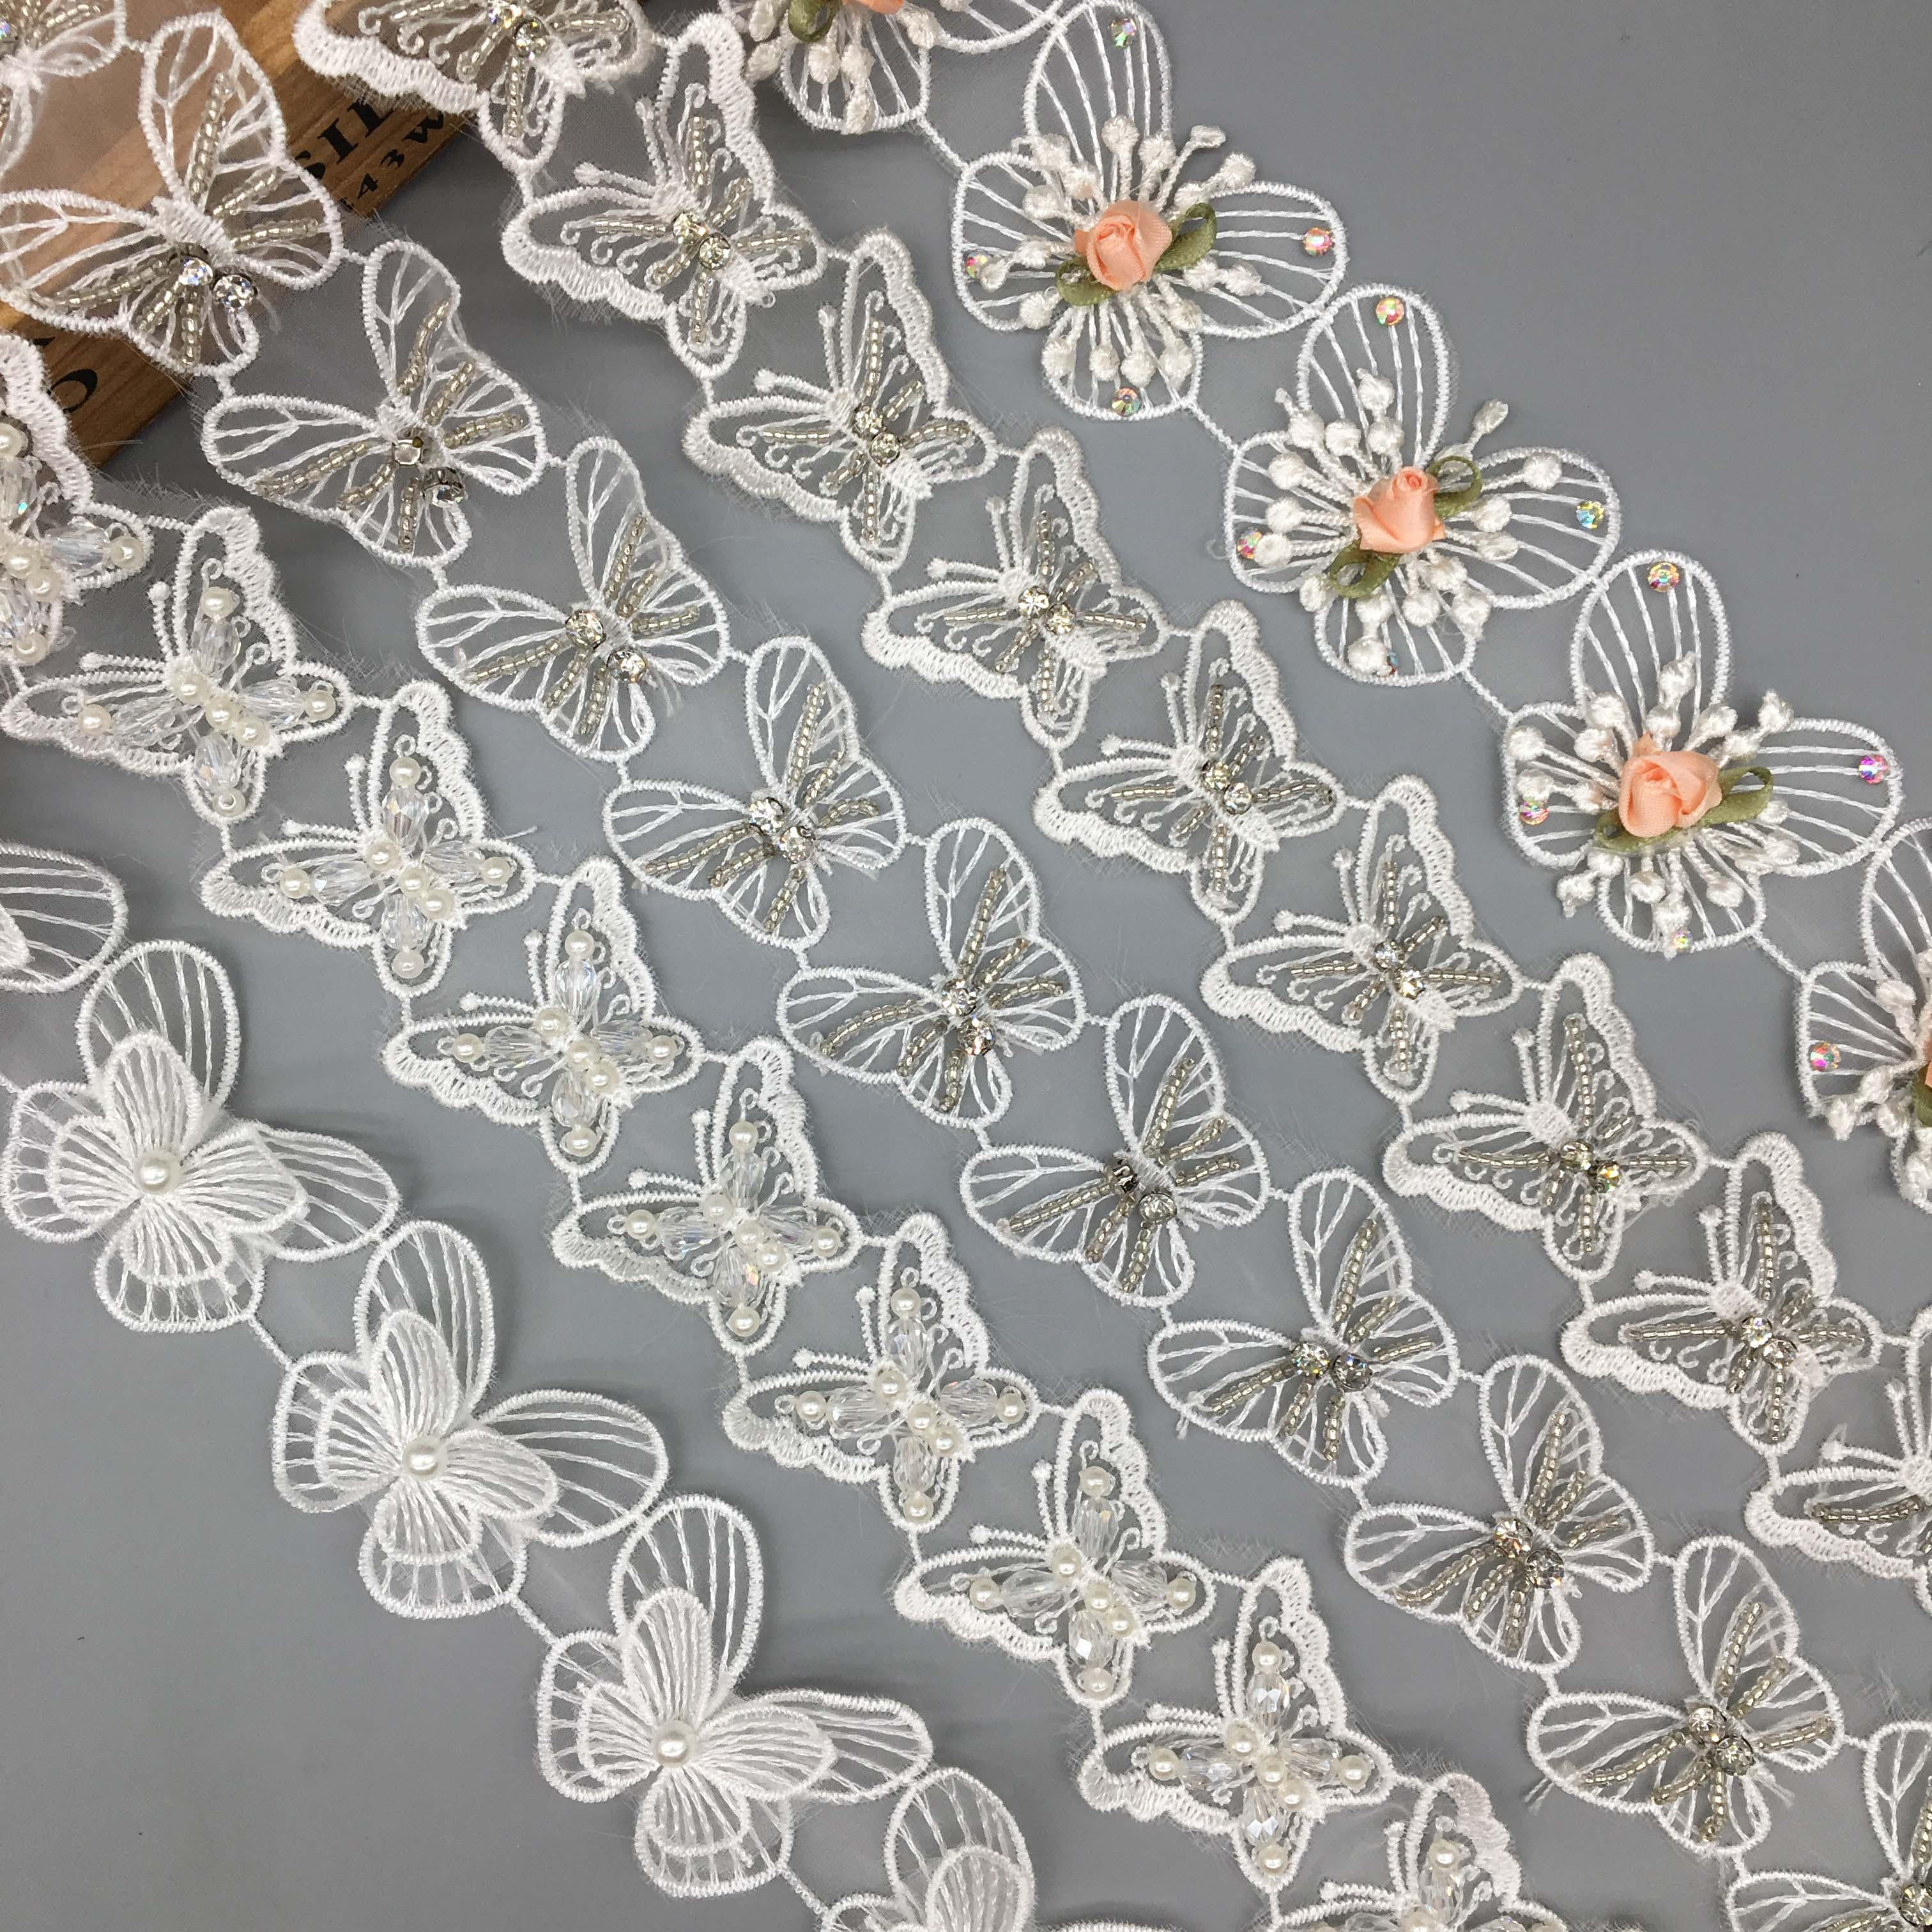 1 Yard Embroidered Pearl Beads Trim Ribbon Sewing Applique DIY Wedding Decor